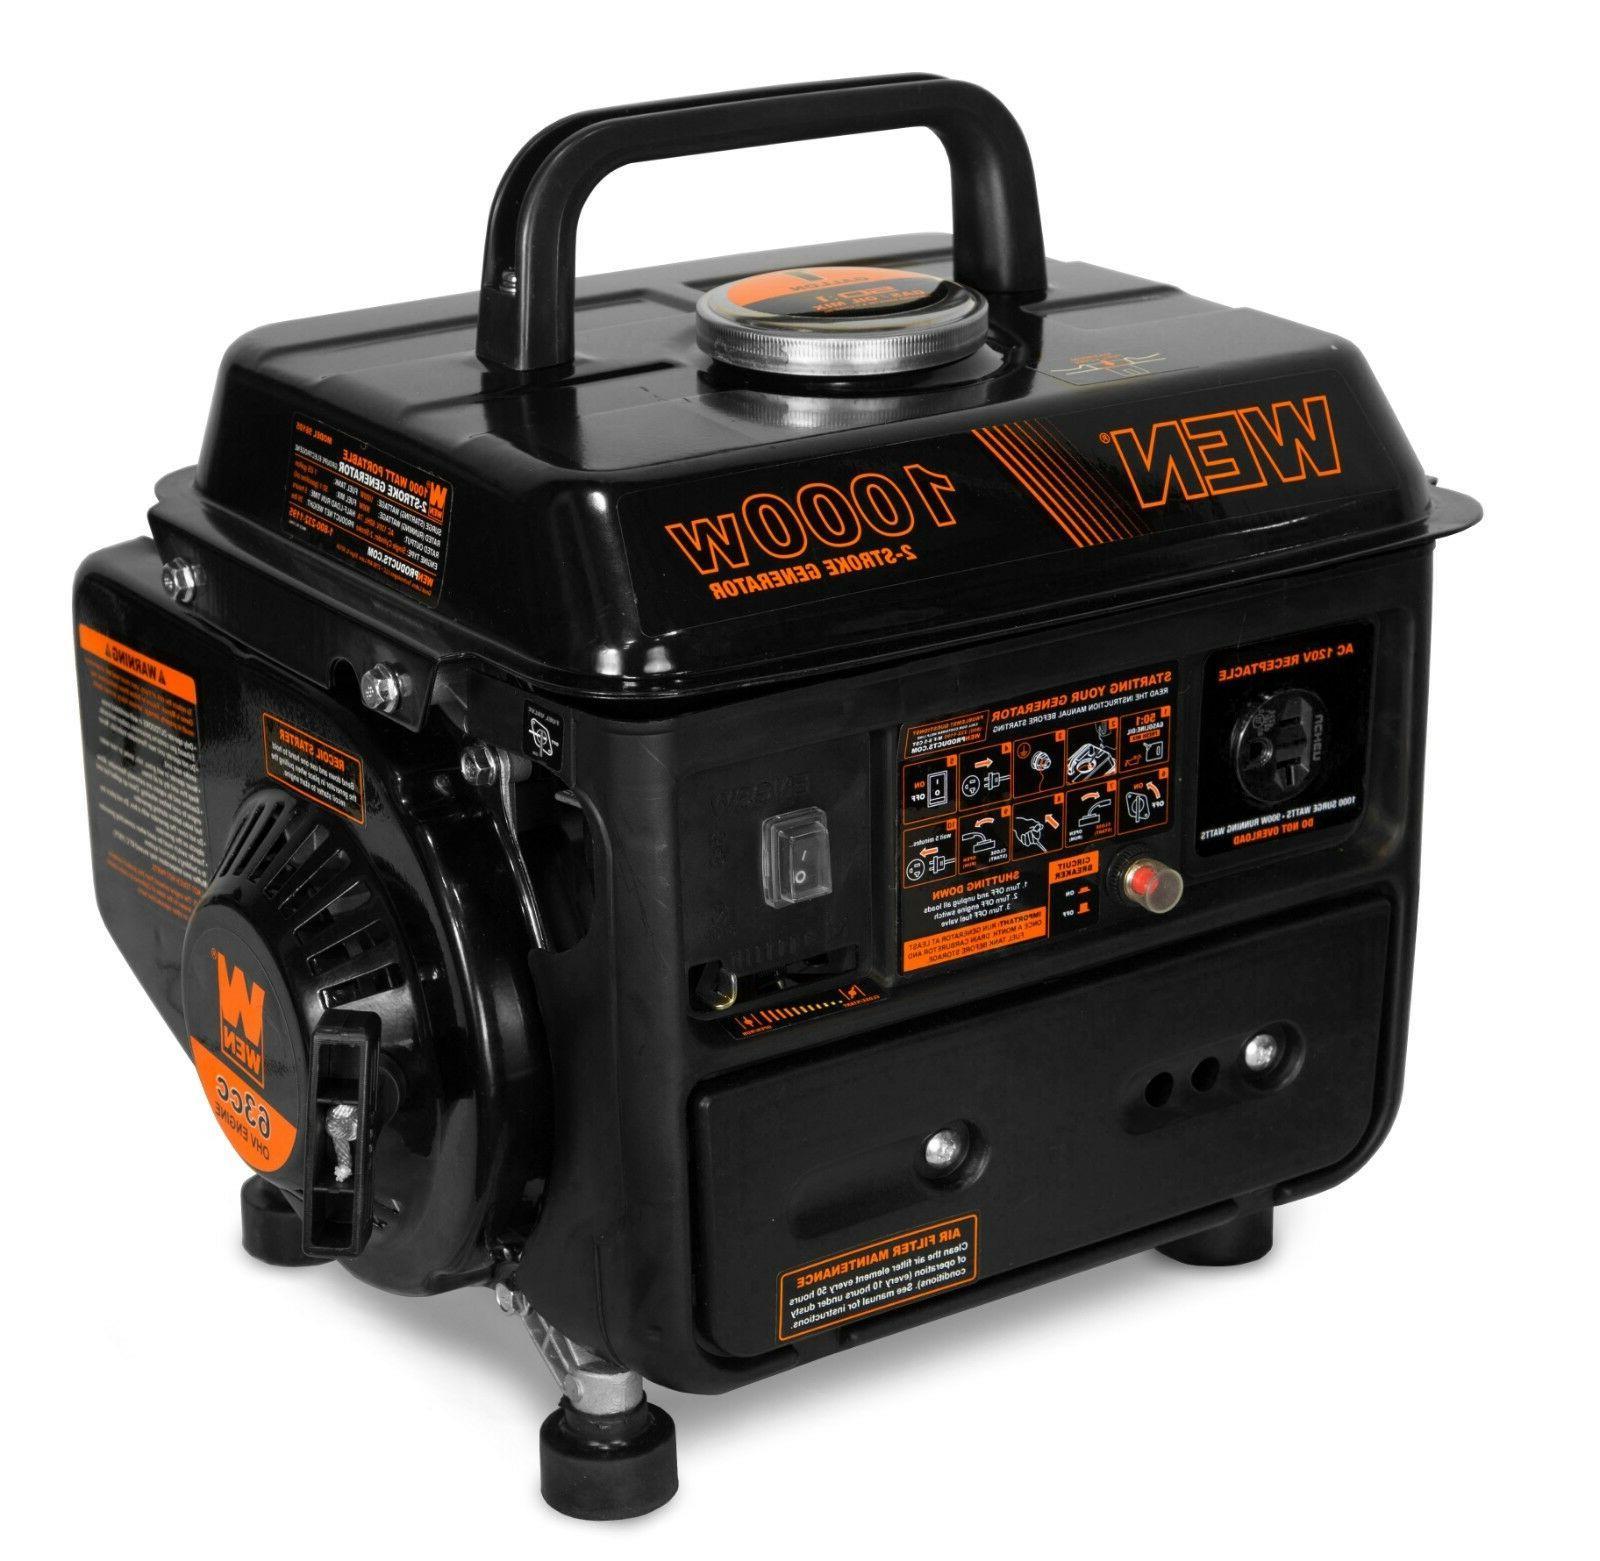 56105 1000 watt portable generator carb compliant